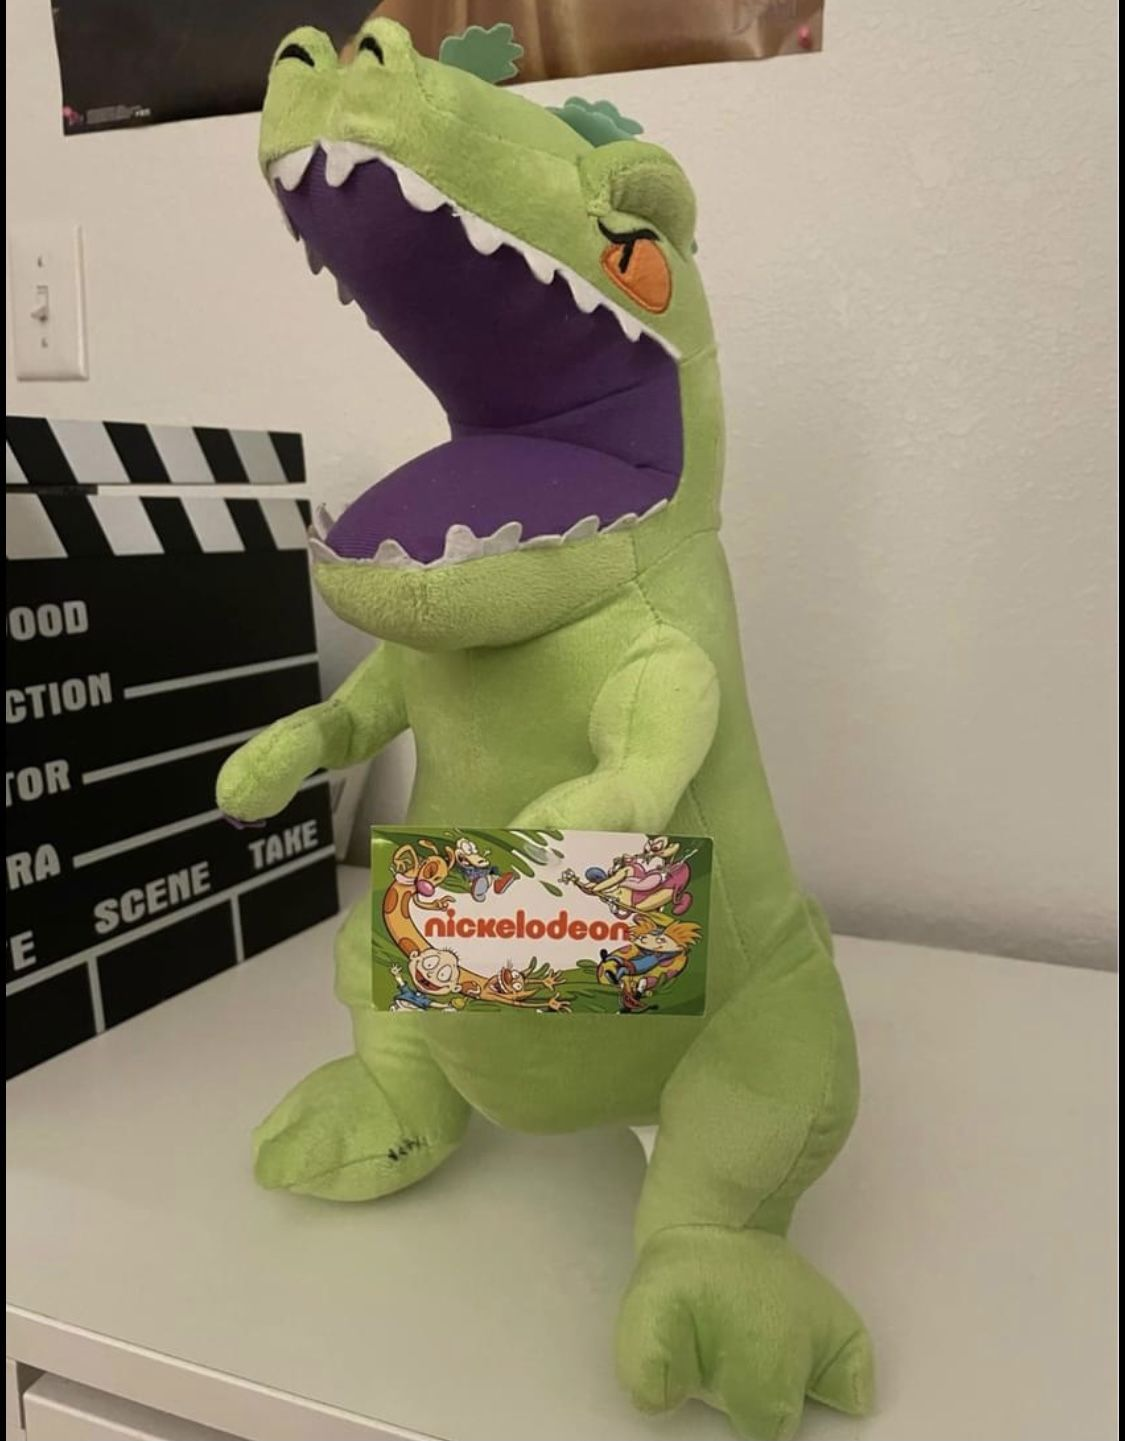 Green Reptar Plush Dinosaur Nickelodeon Animal Toy 90's RARE